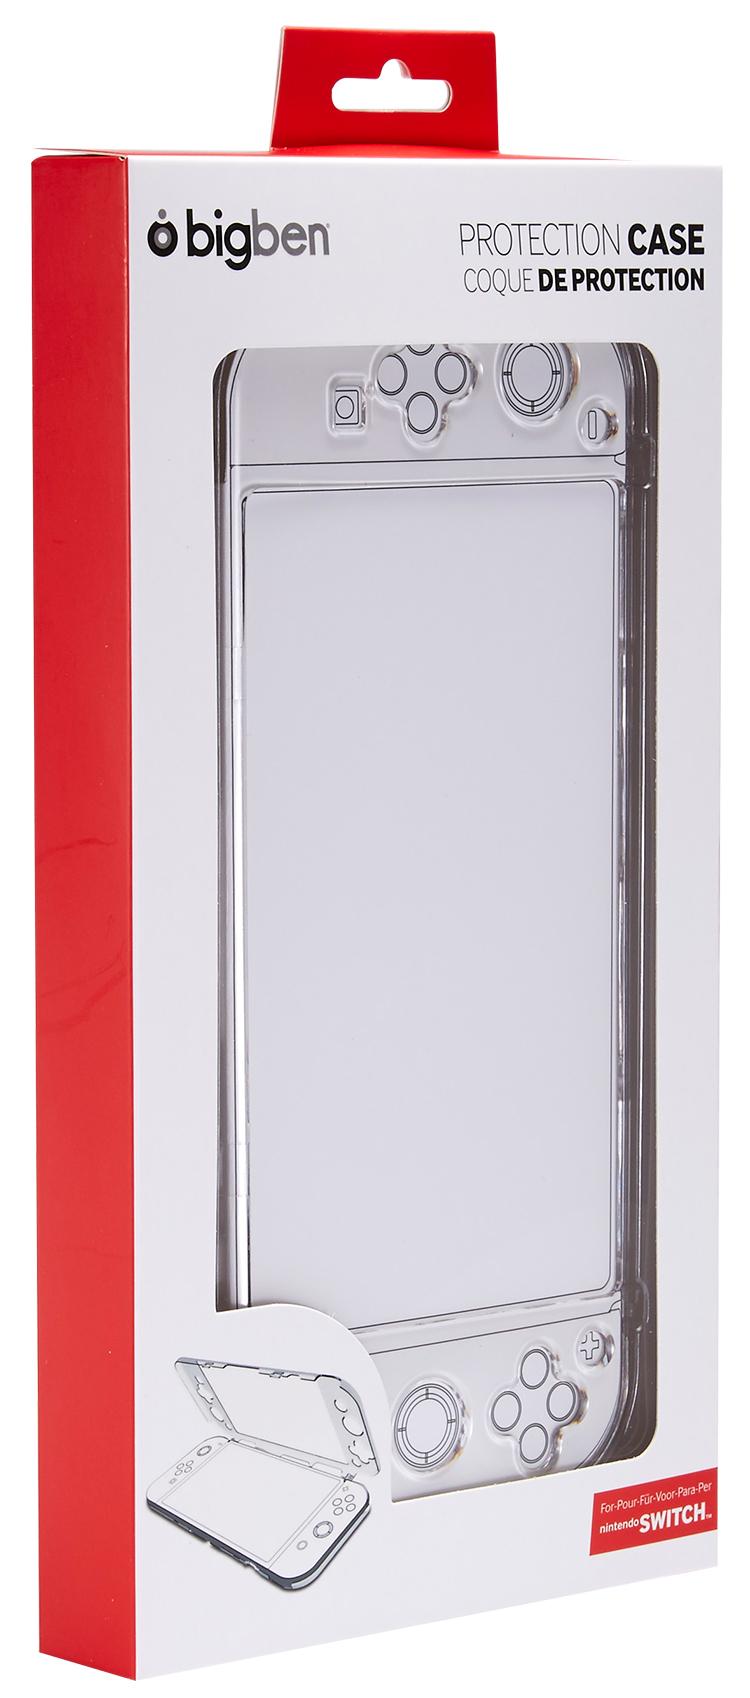 Polycarbonate case for Nintendo Switch™ - Image  #2tutu#4tutu